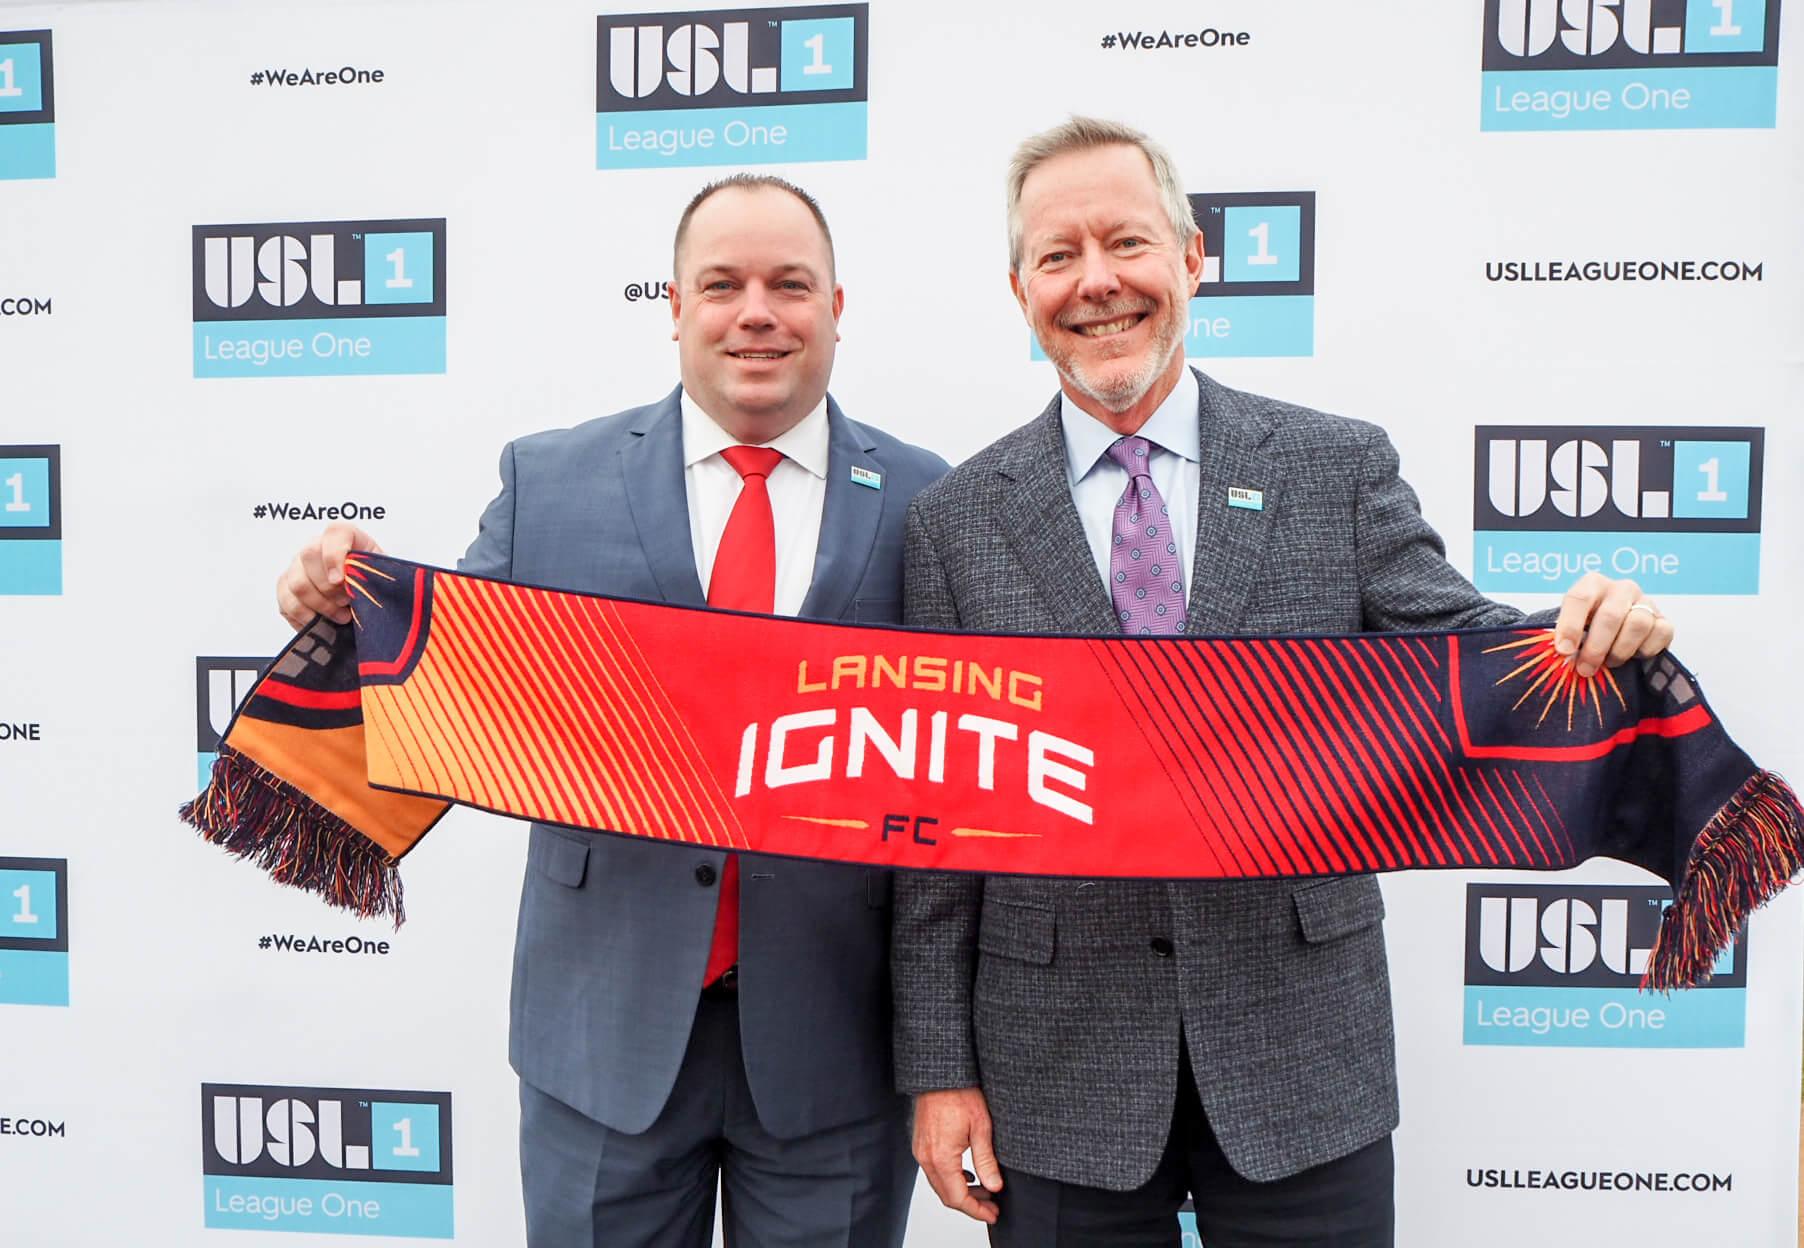 Photo by Aaron Cranford // USL League One Senior VP Steven Short with Lansing Ignite FC Owner Tom Dickson